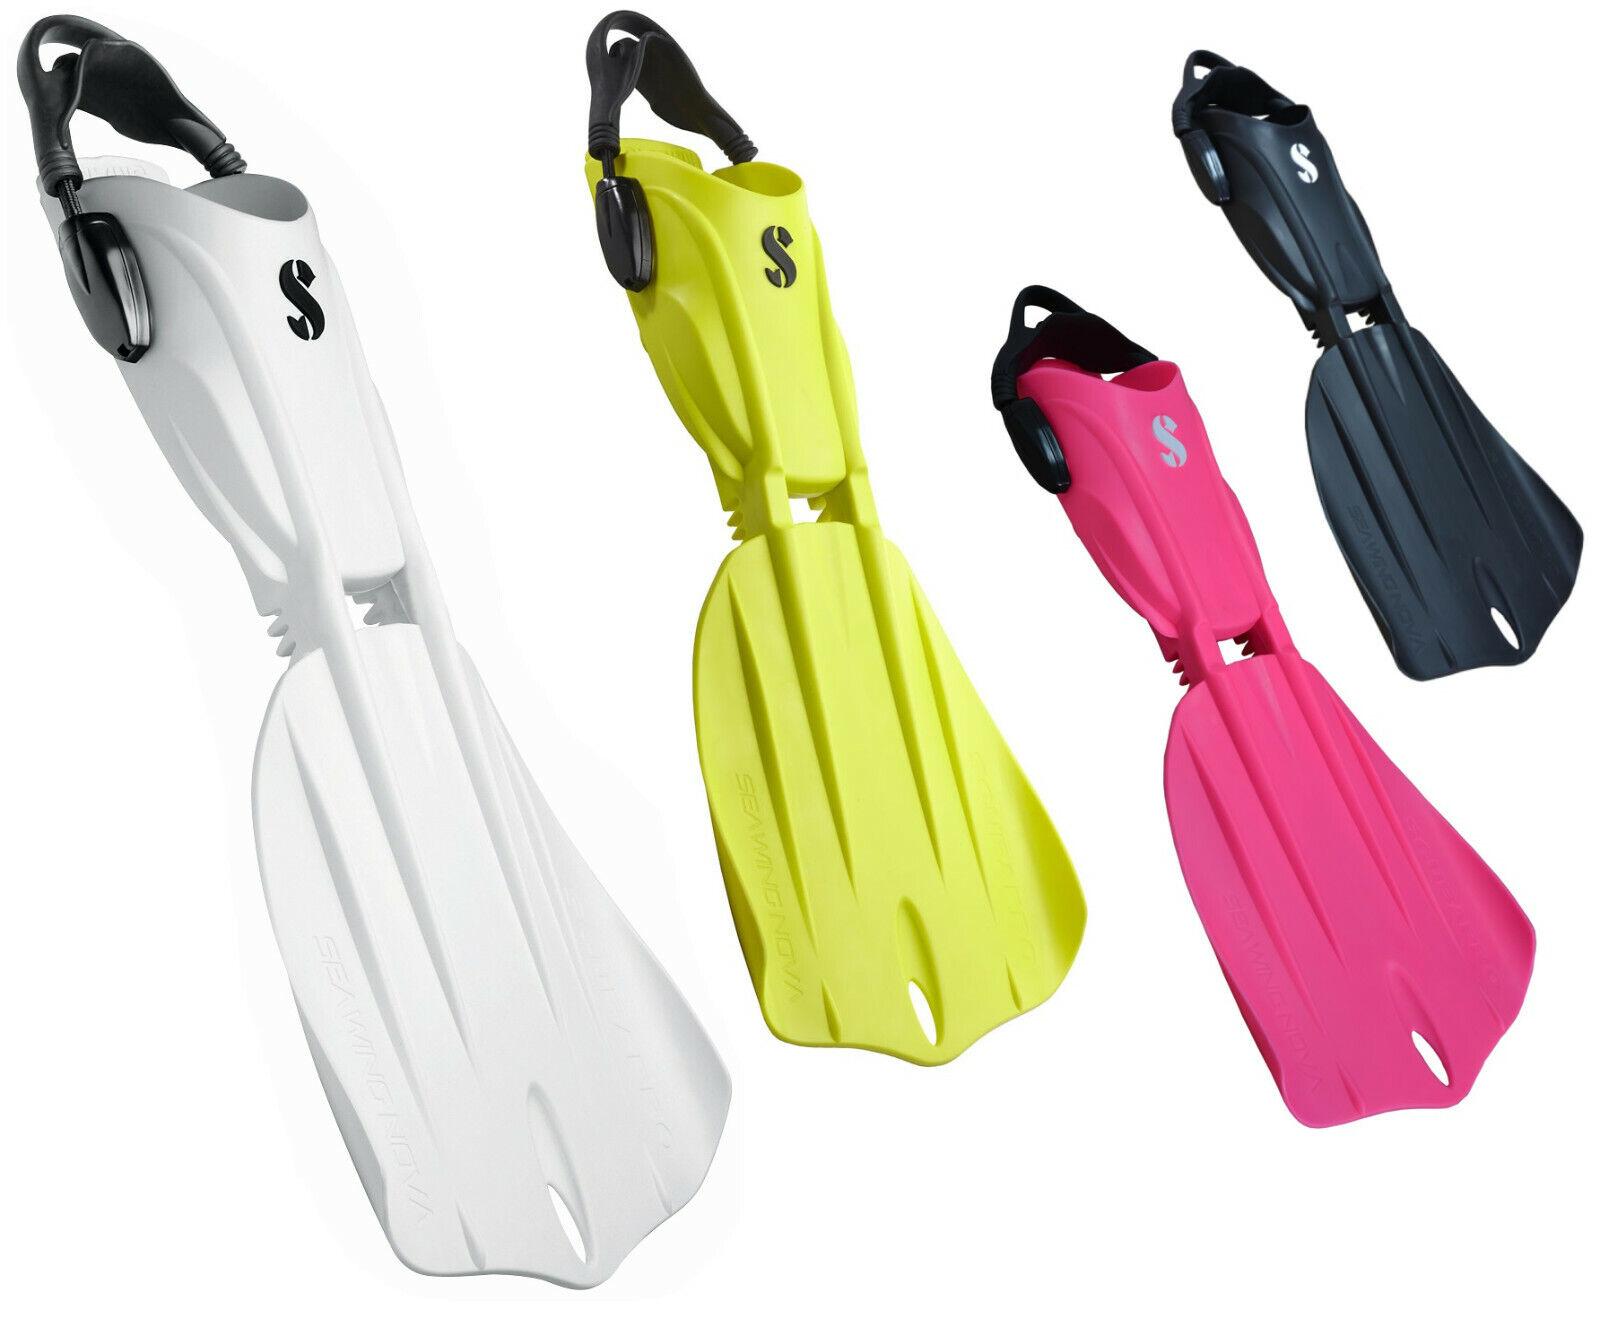 Scubapro SEAWING NOVA Geräteflosse Fersenbandflosse NEU vom Fachhandel